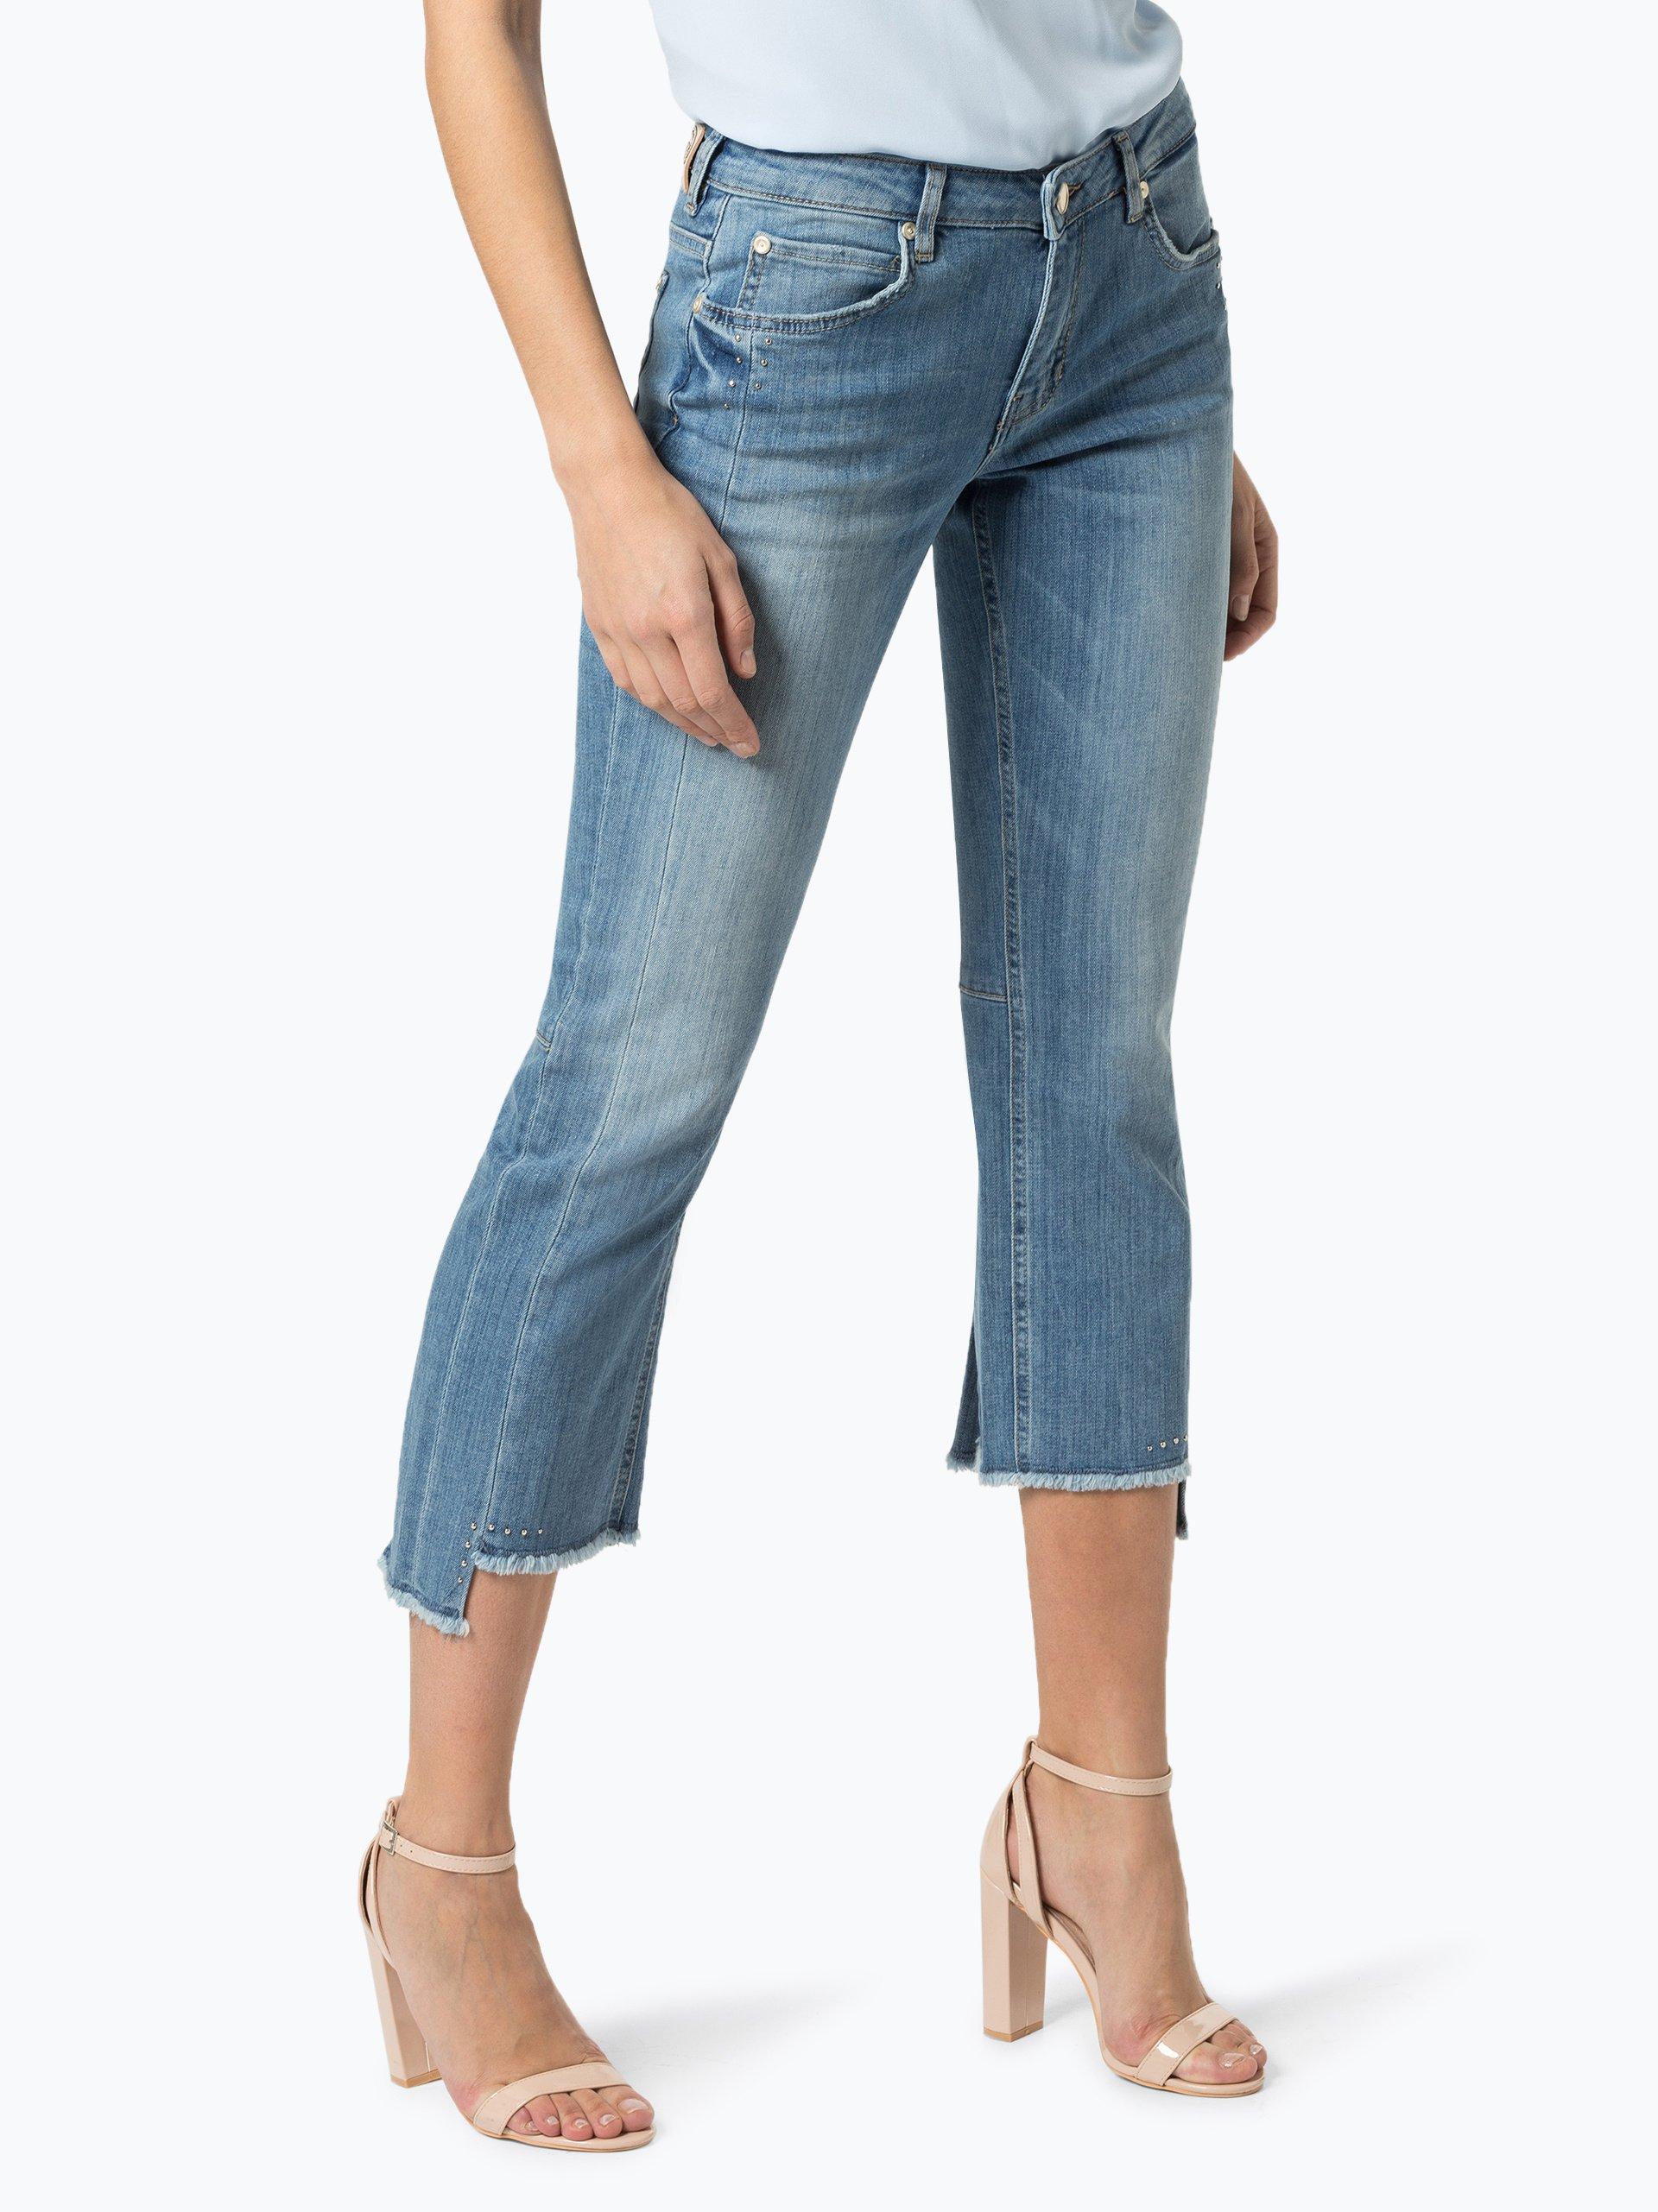 Rosner Damen Jeans - Masha